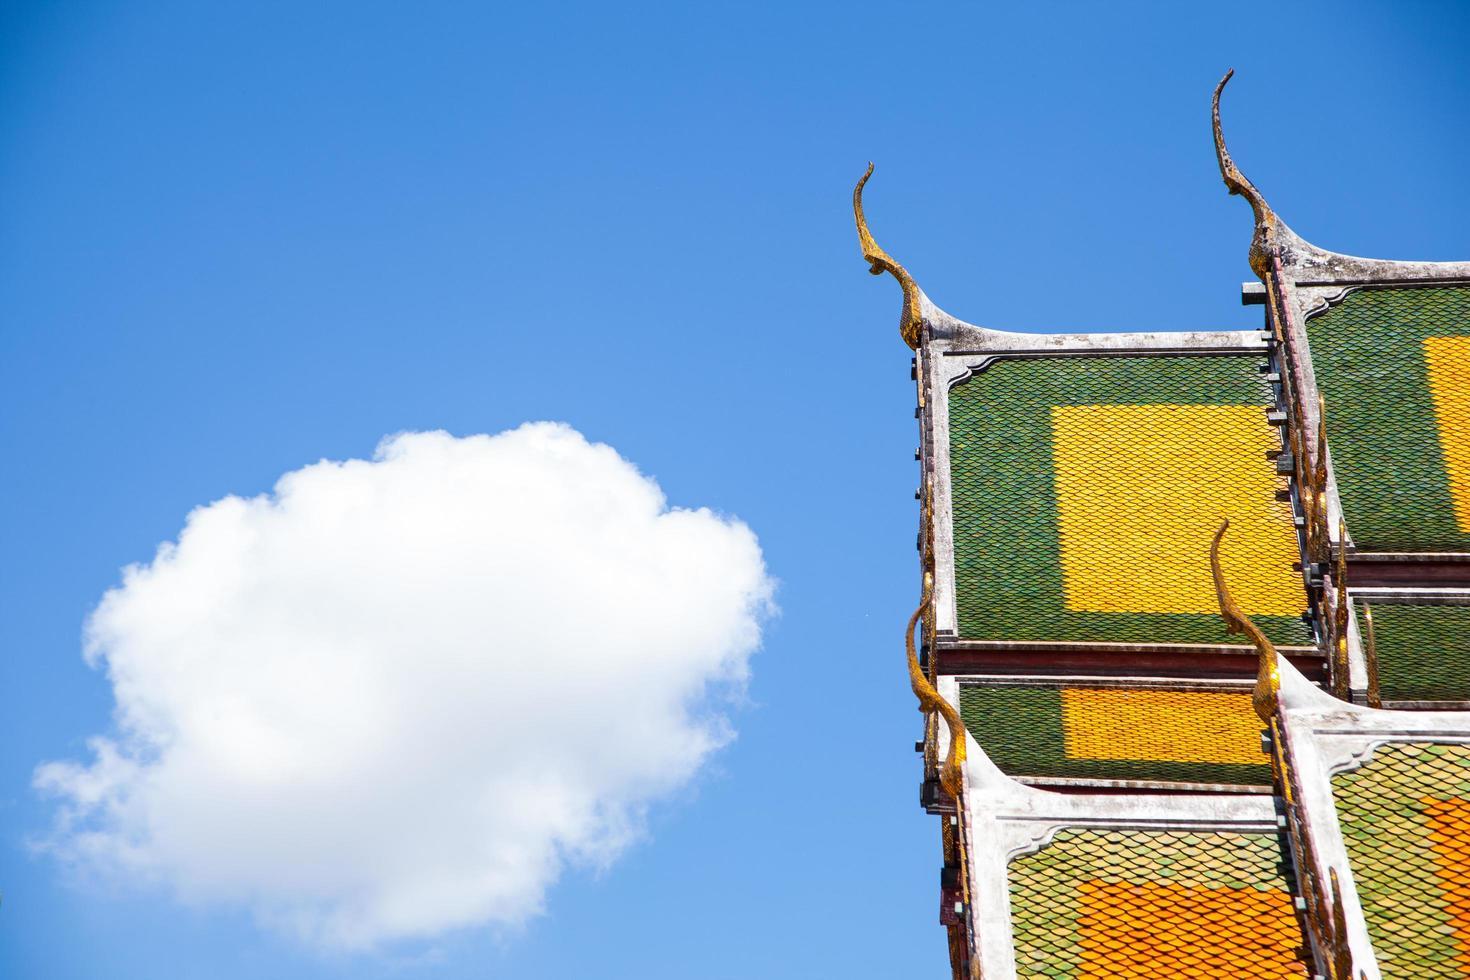 tetto e cielo del tempio thailandese foto